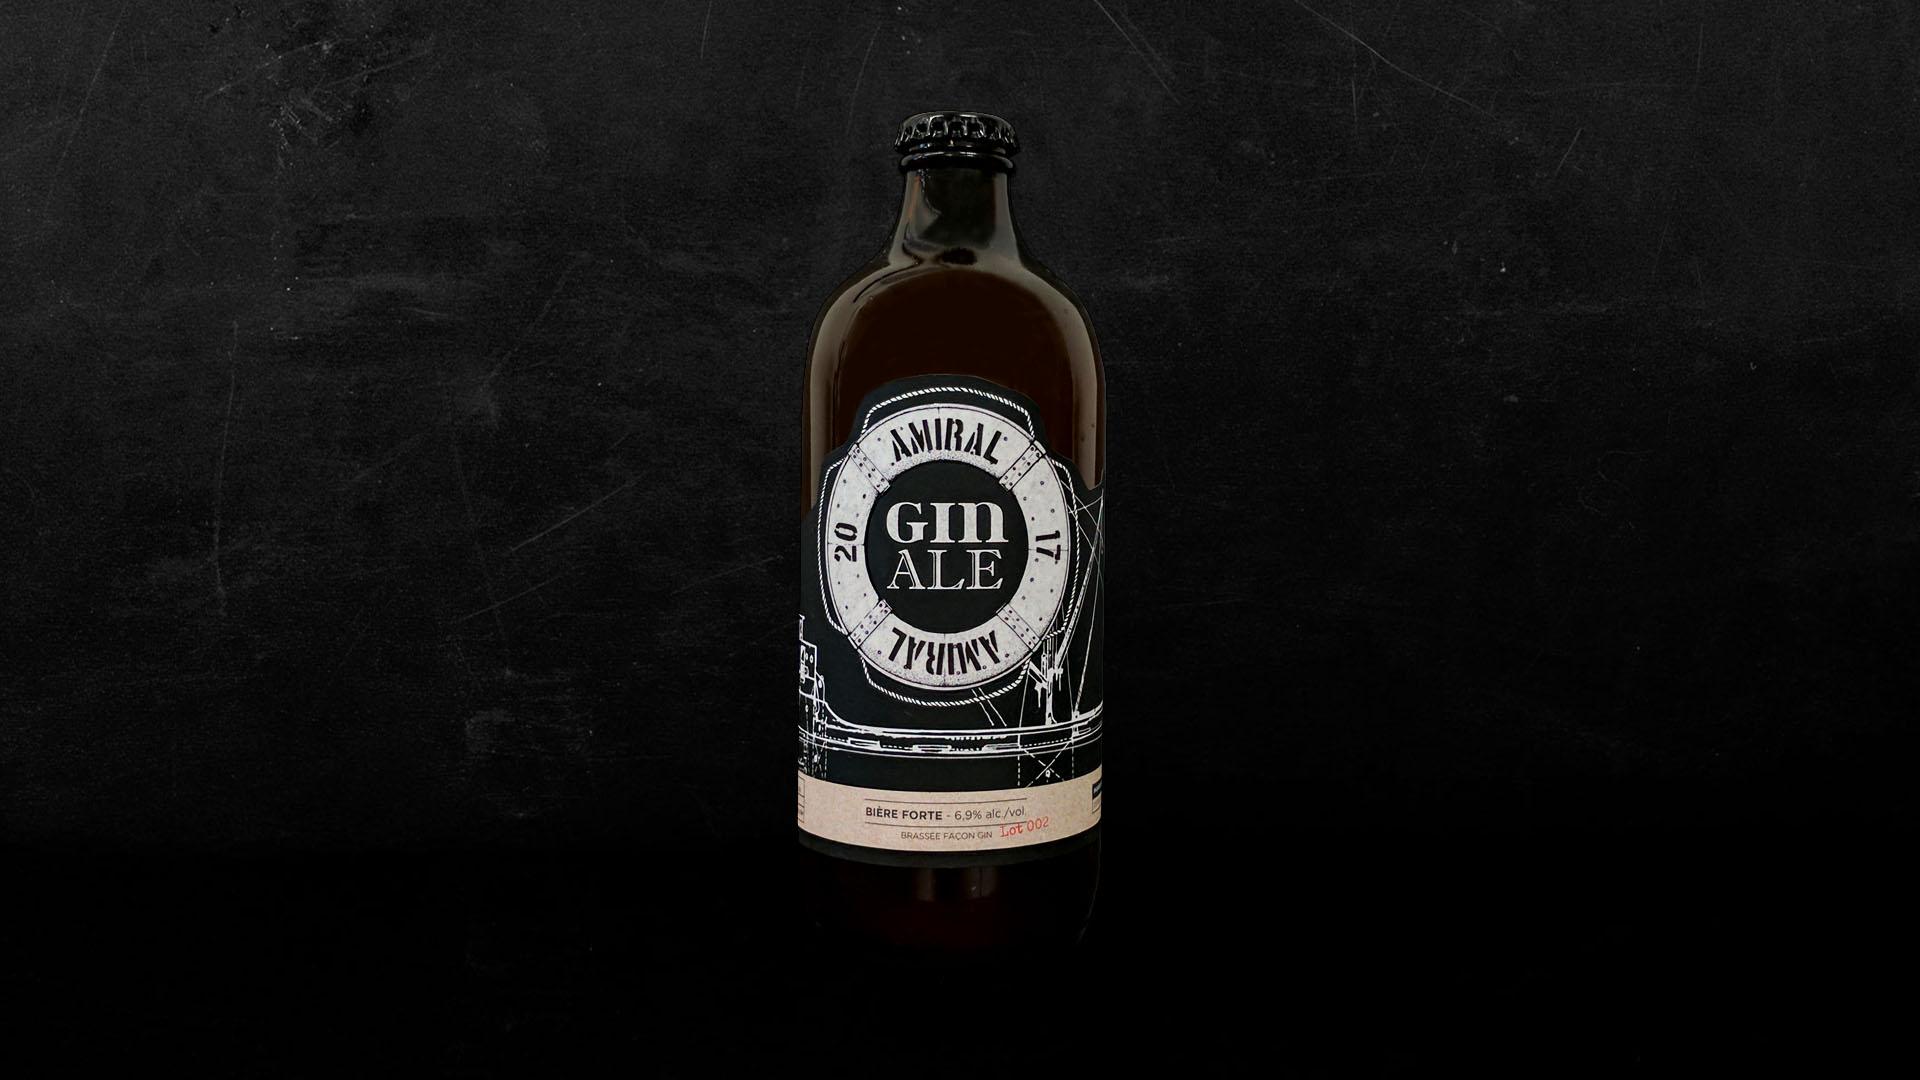 Amiral - Gin Ale